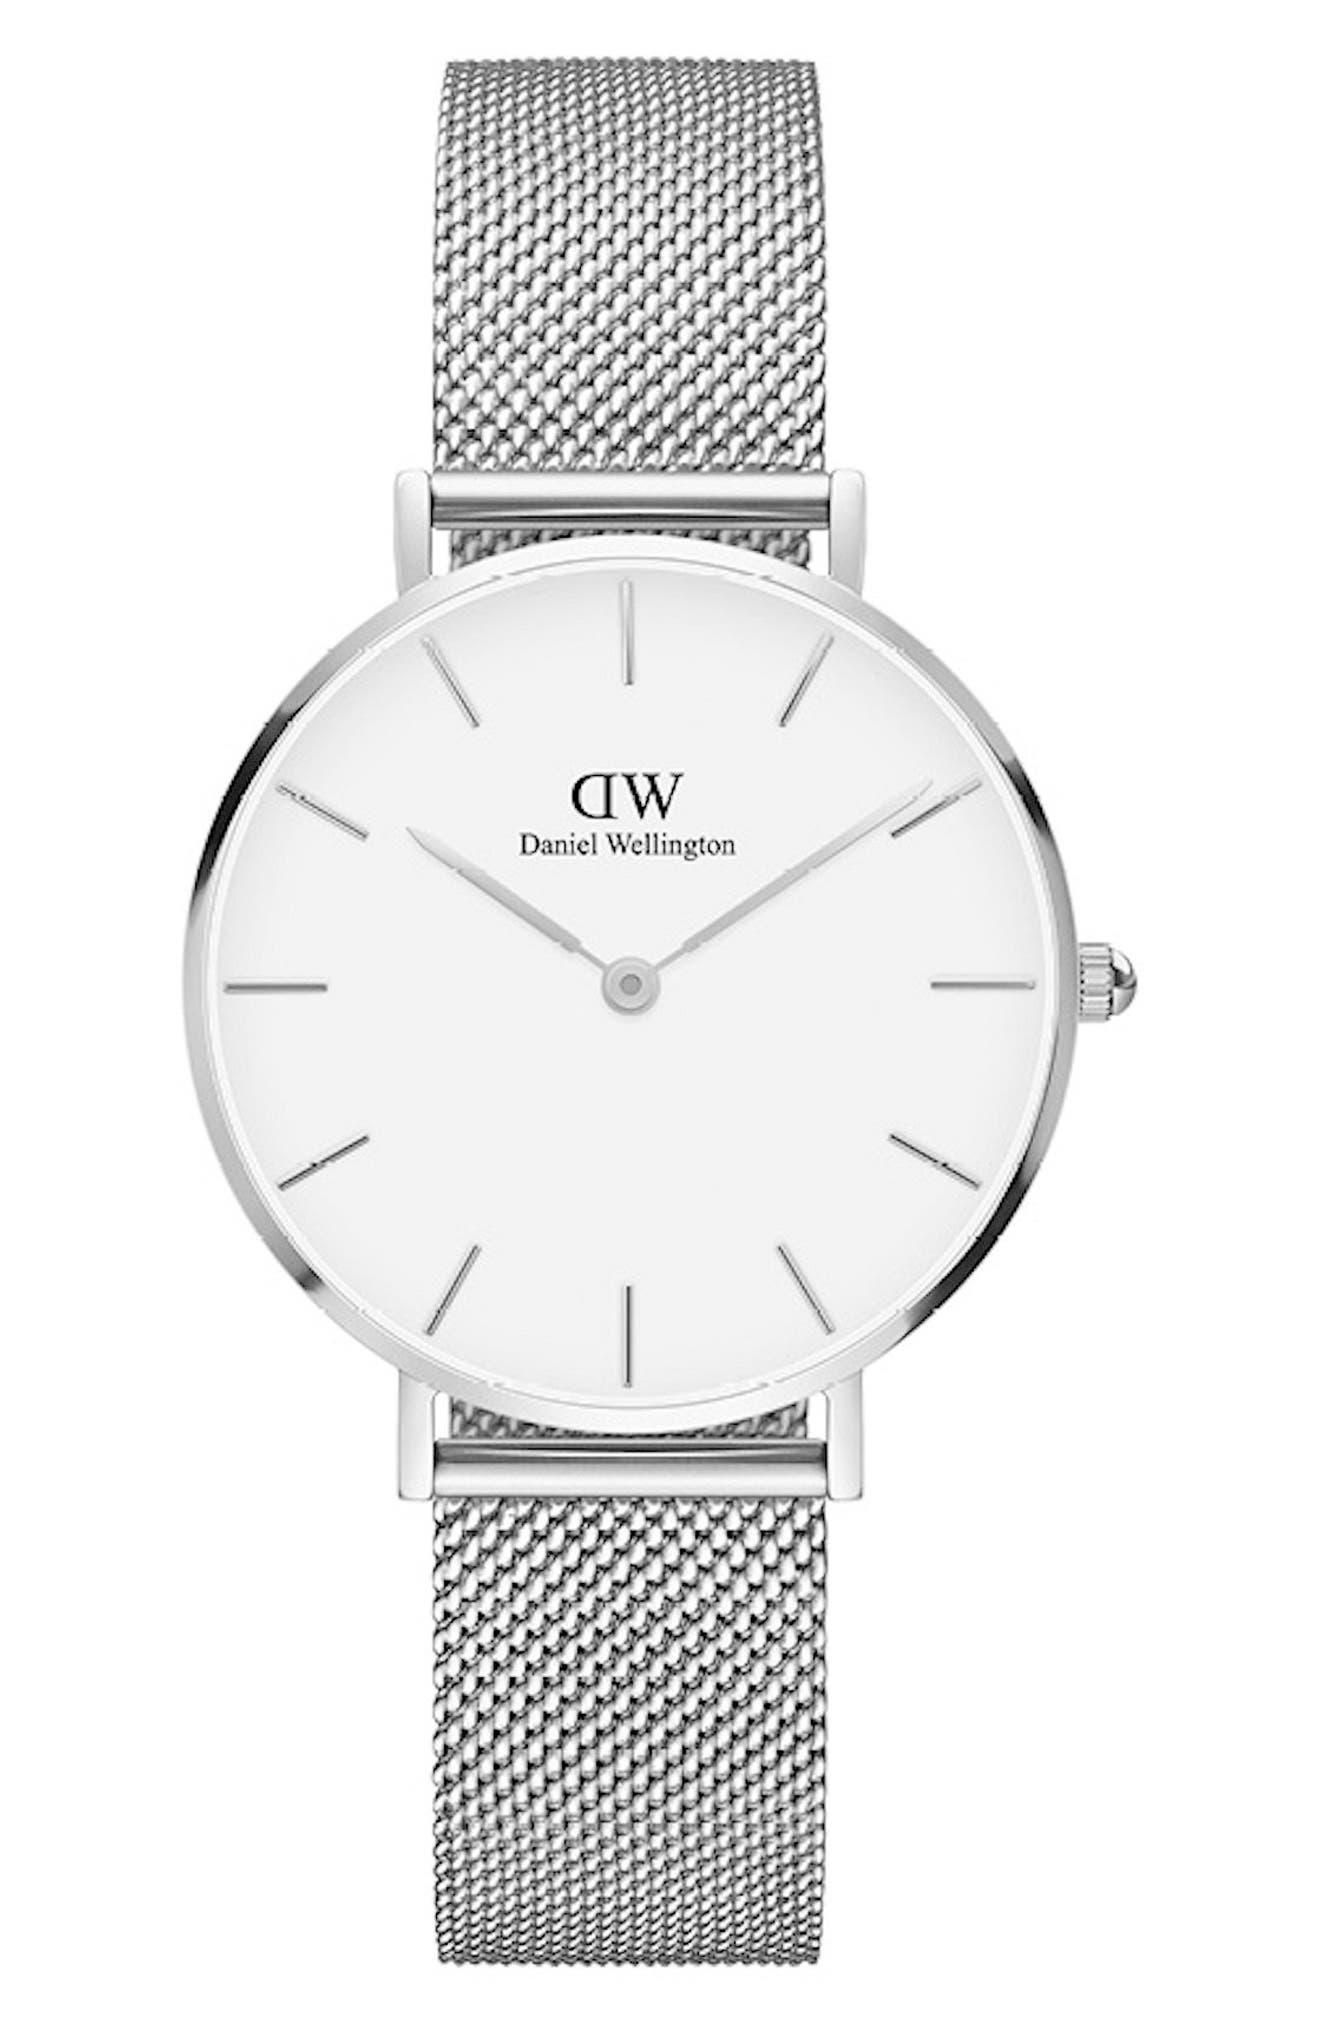 DANIEL WELLINGTON, Classic Petite Mesh Strap Watch, 32mm, Main thumbnail 1, color, SILVER/ WHITE/ SILVER